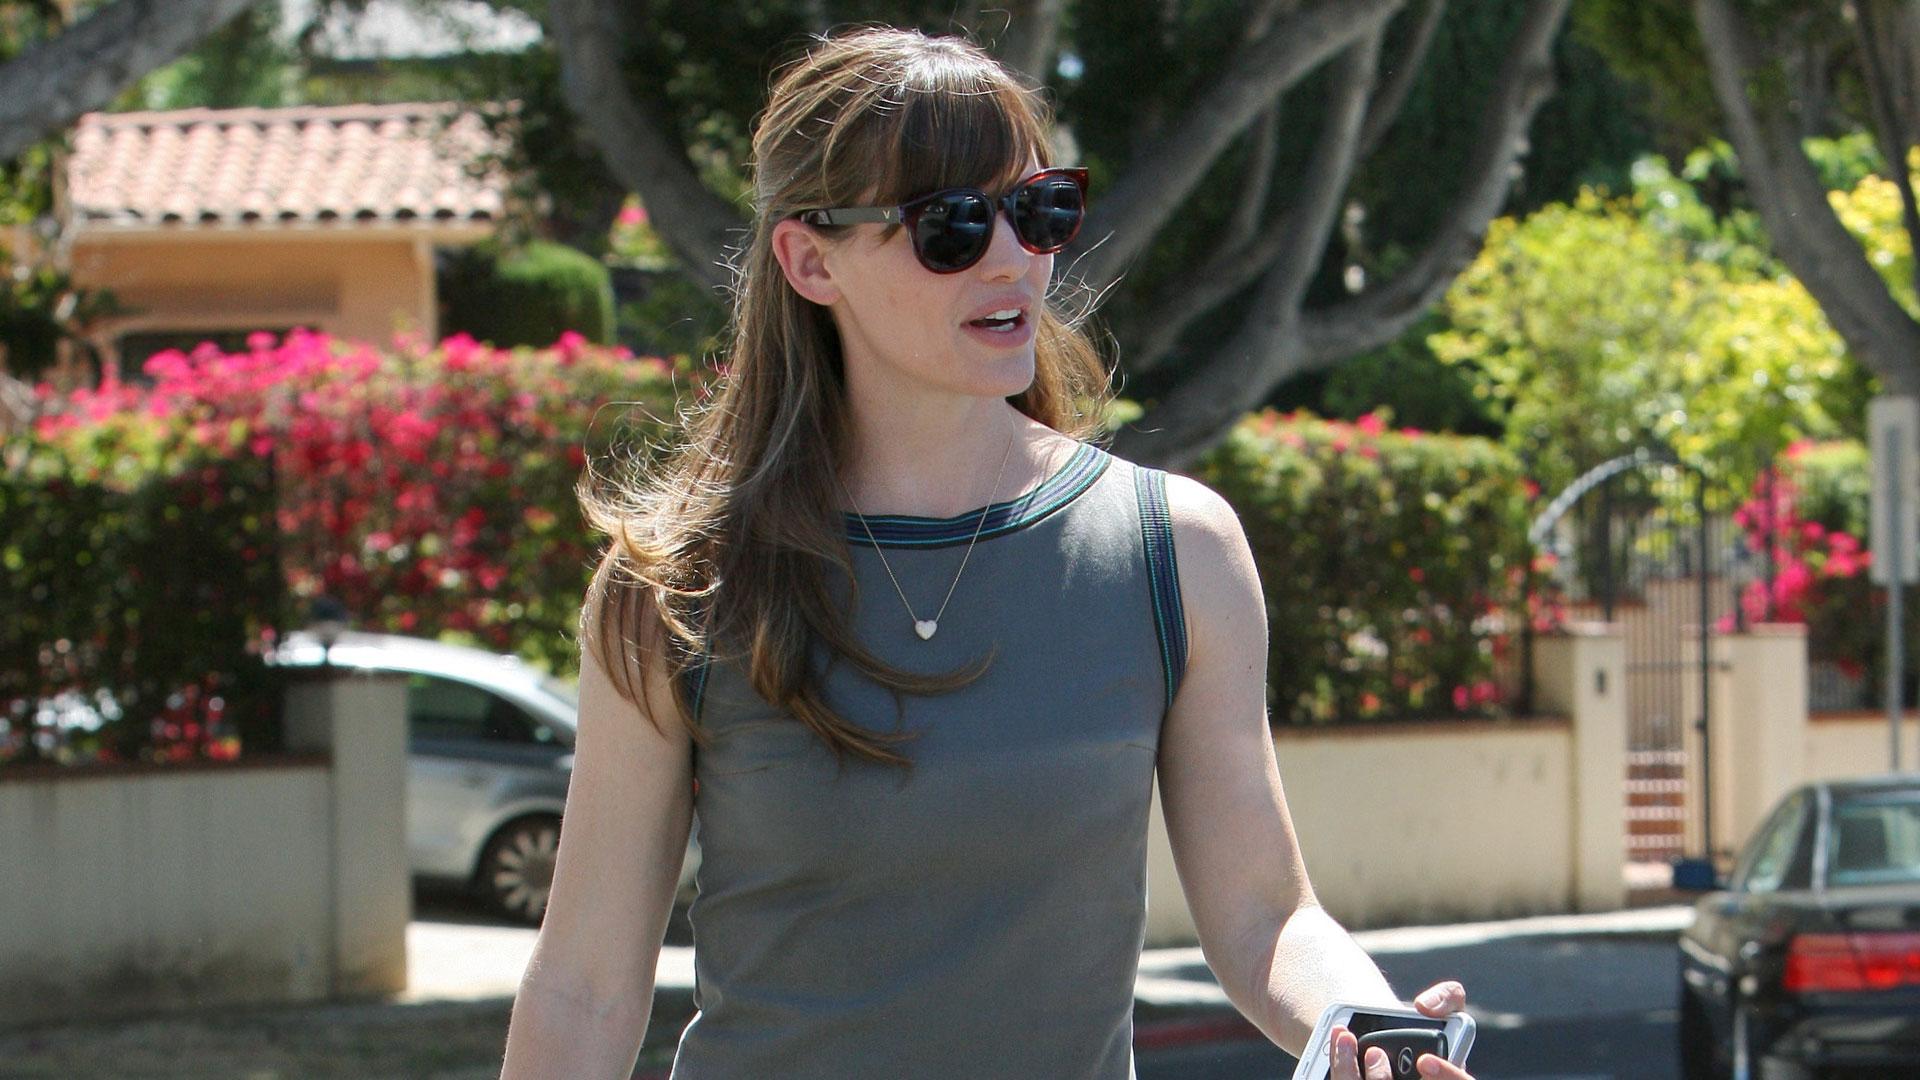 Jennifer Garner: Working mom